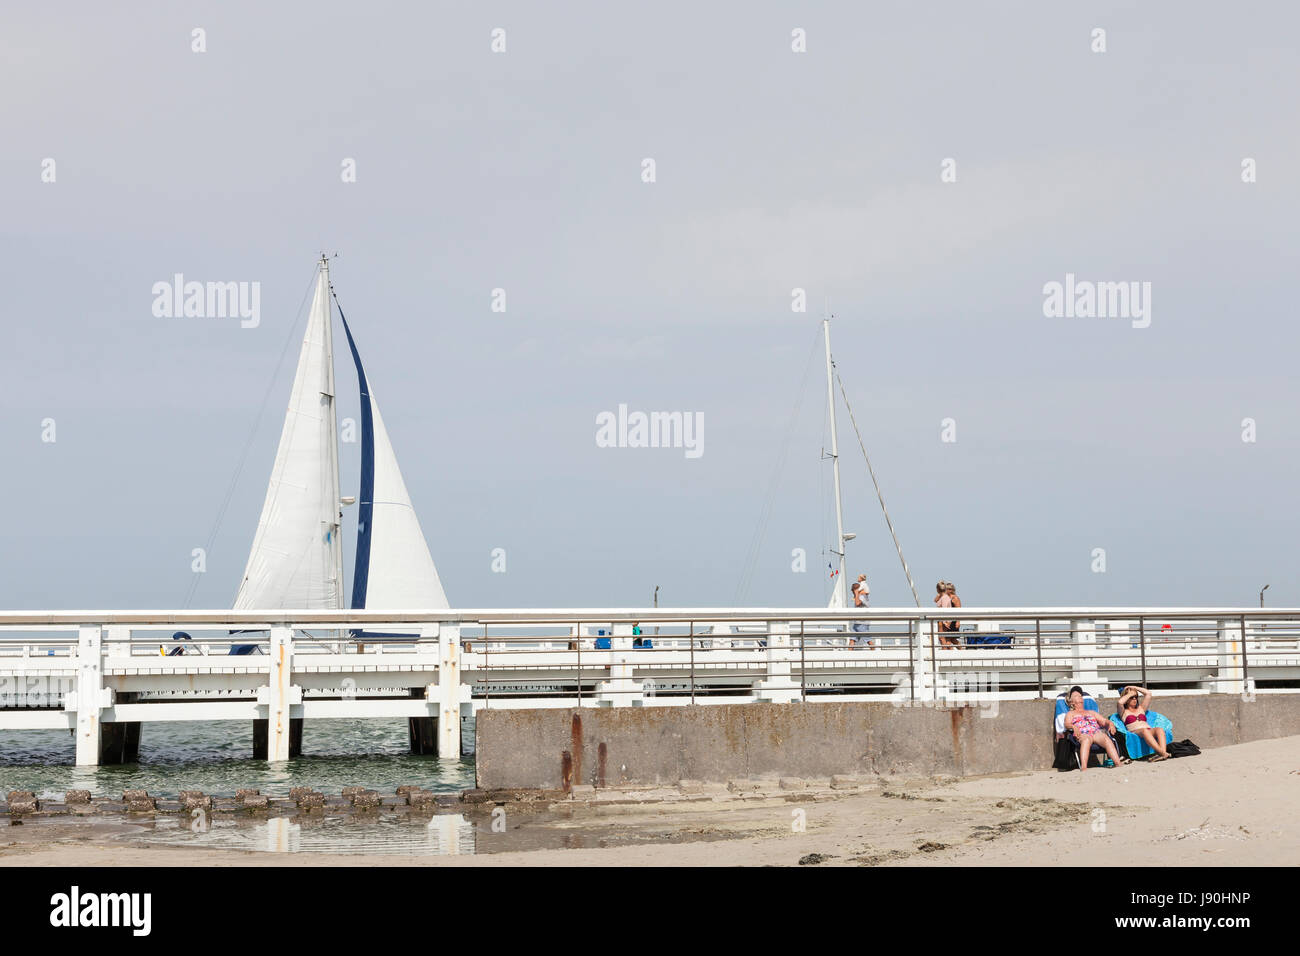 promenade bateau nieuwpoort